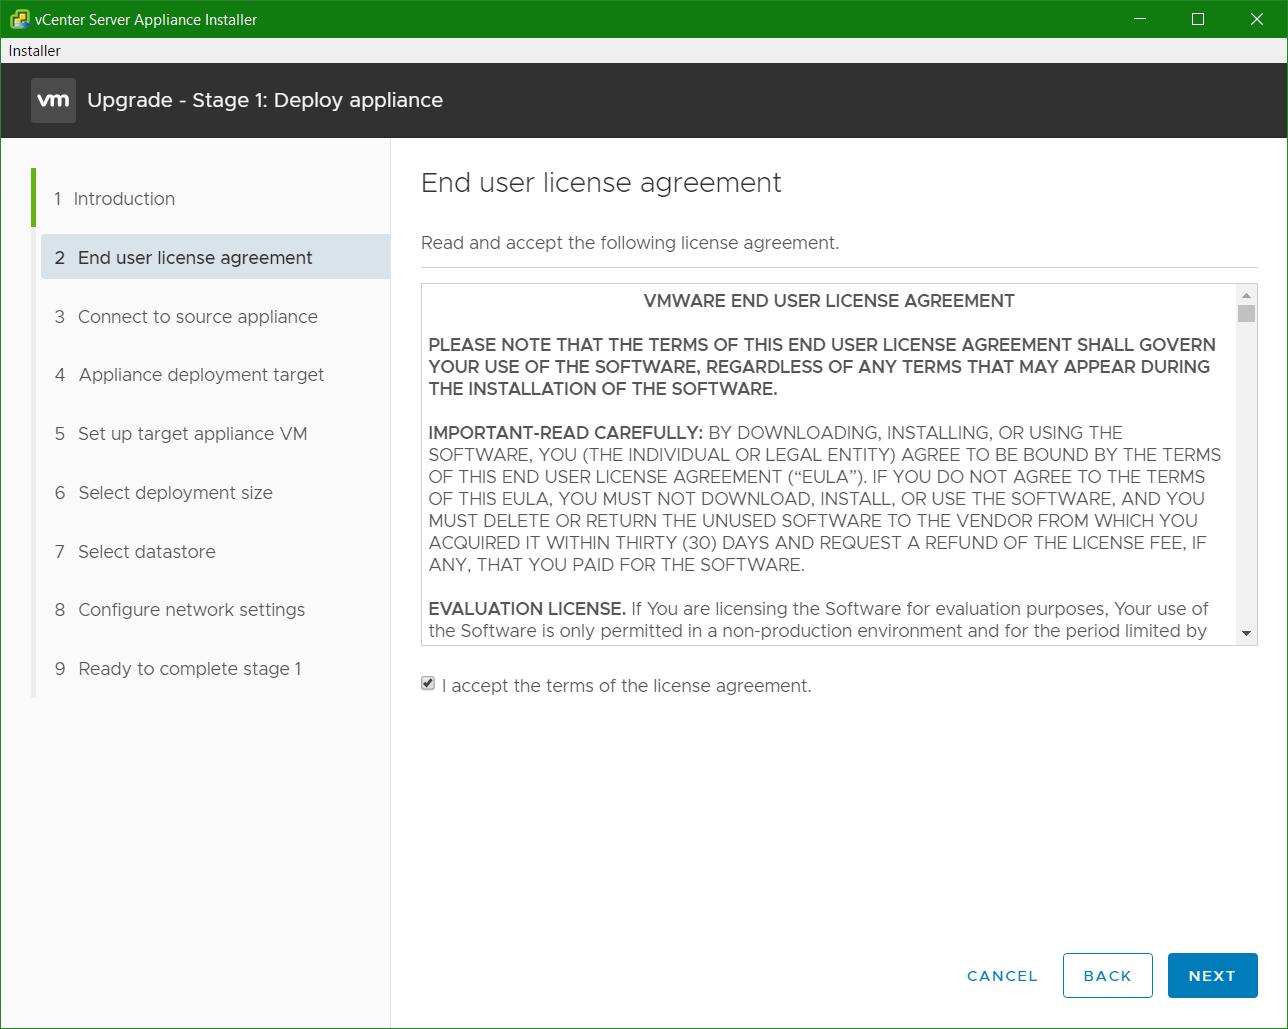 domalab.com VCSA upgrade stage 1 eula